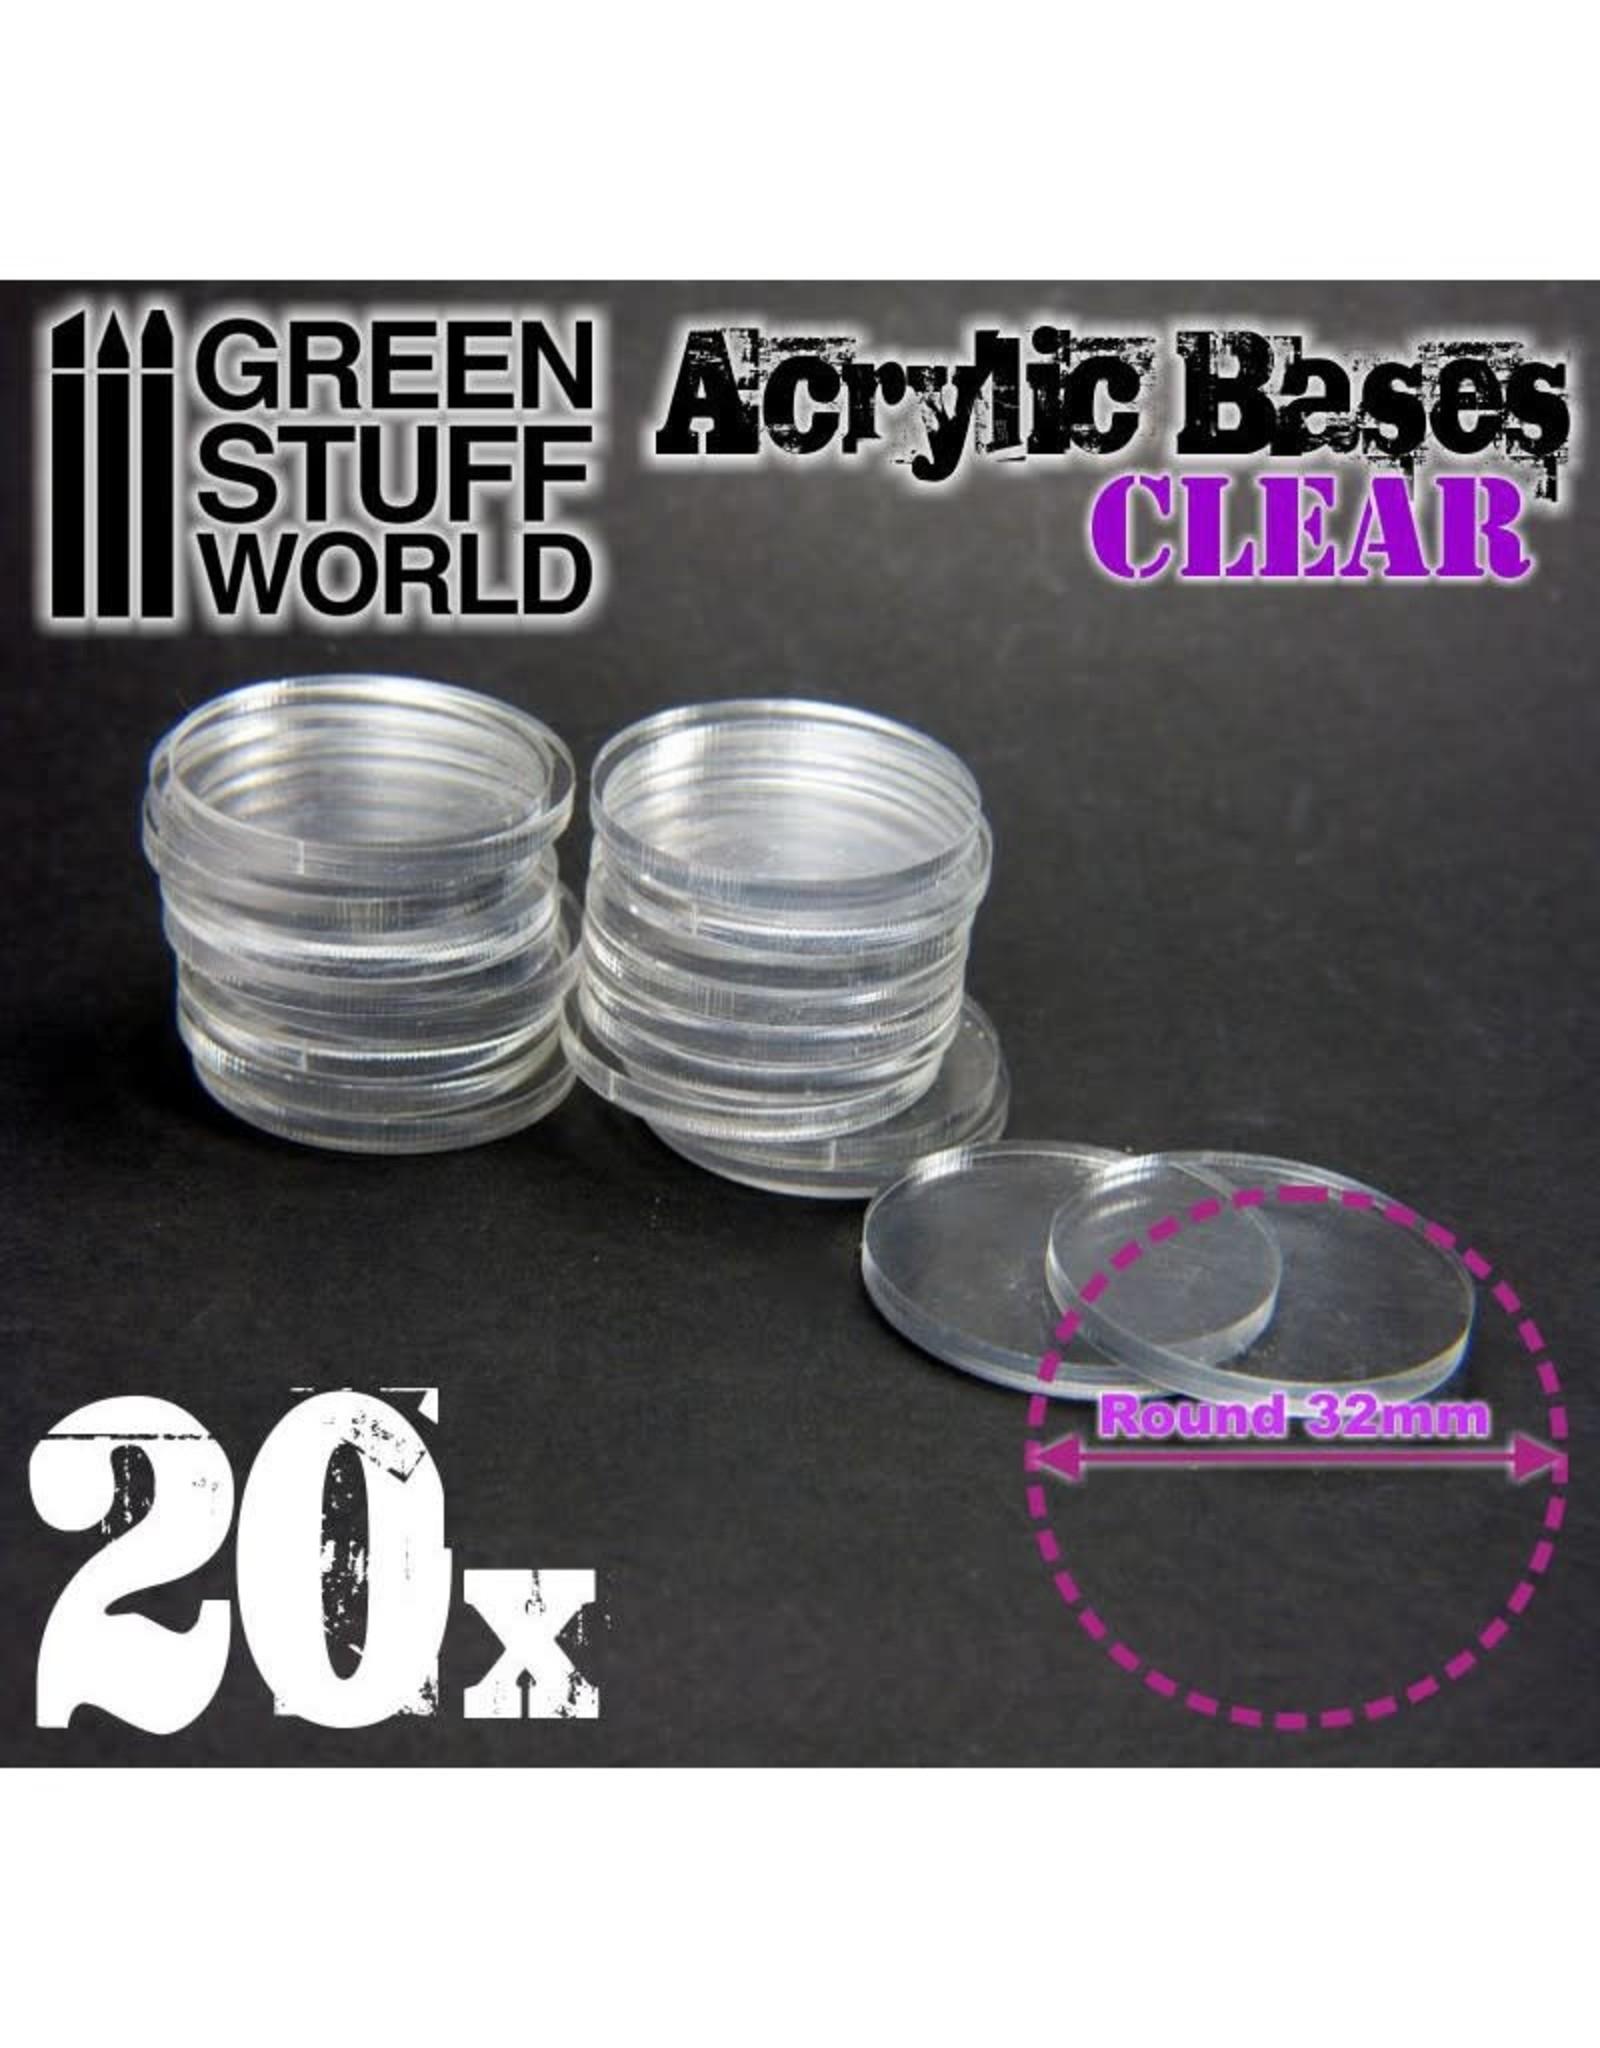 ACRYLIC BASES 32MM - CLEAR